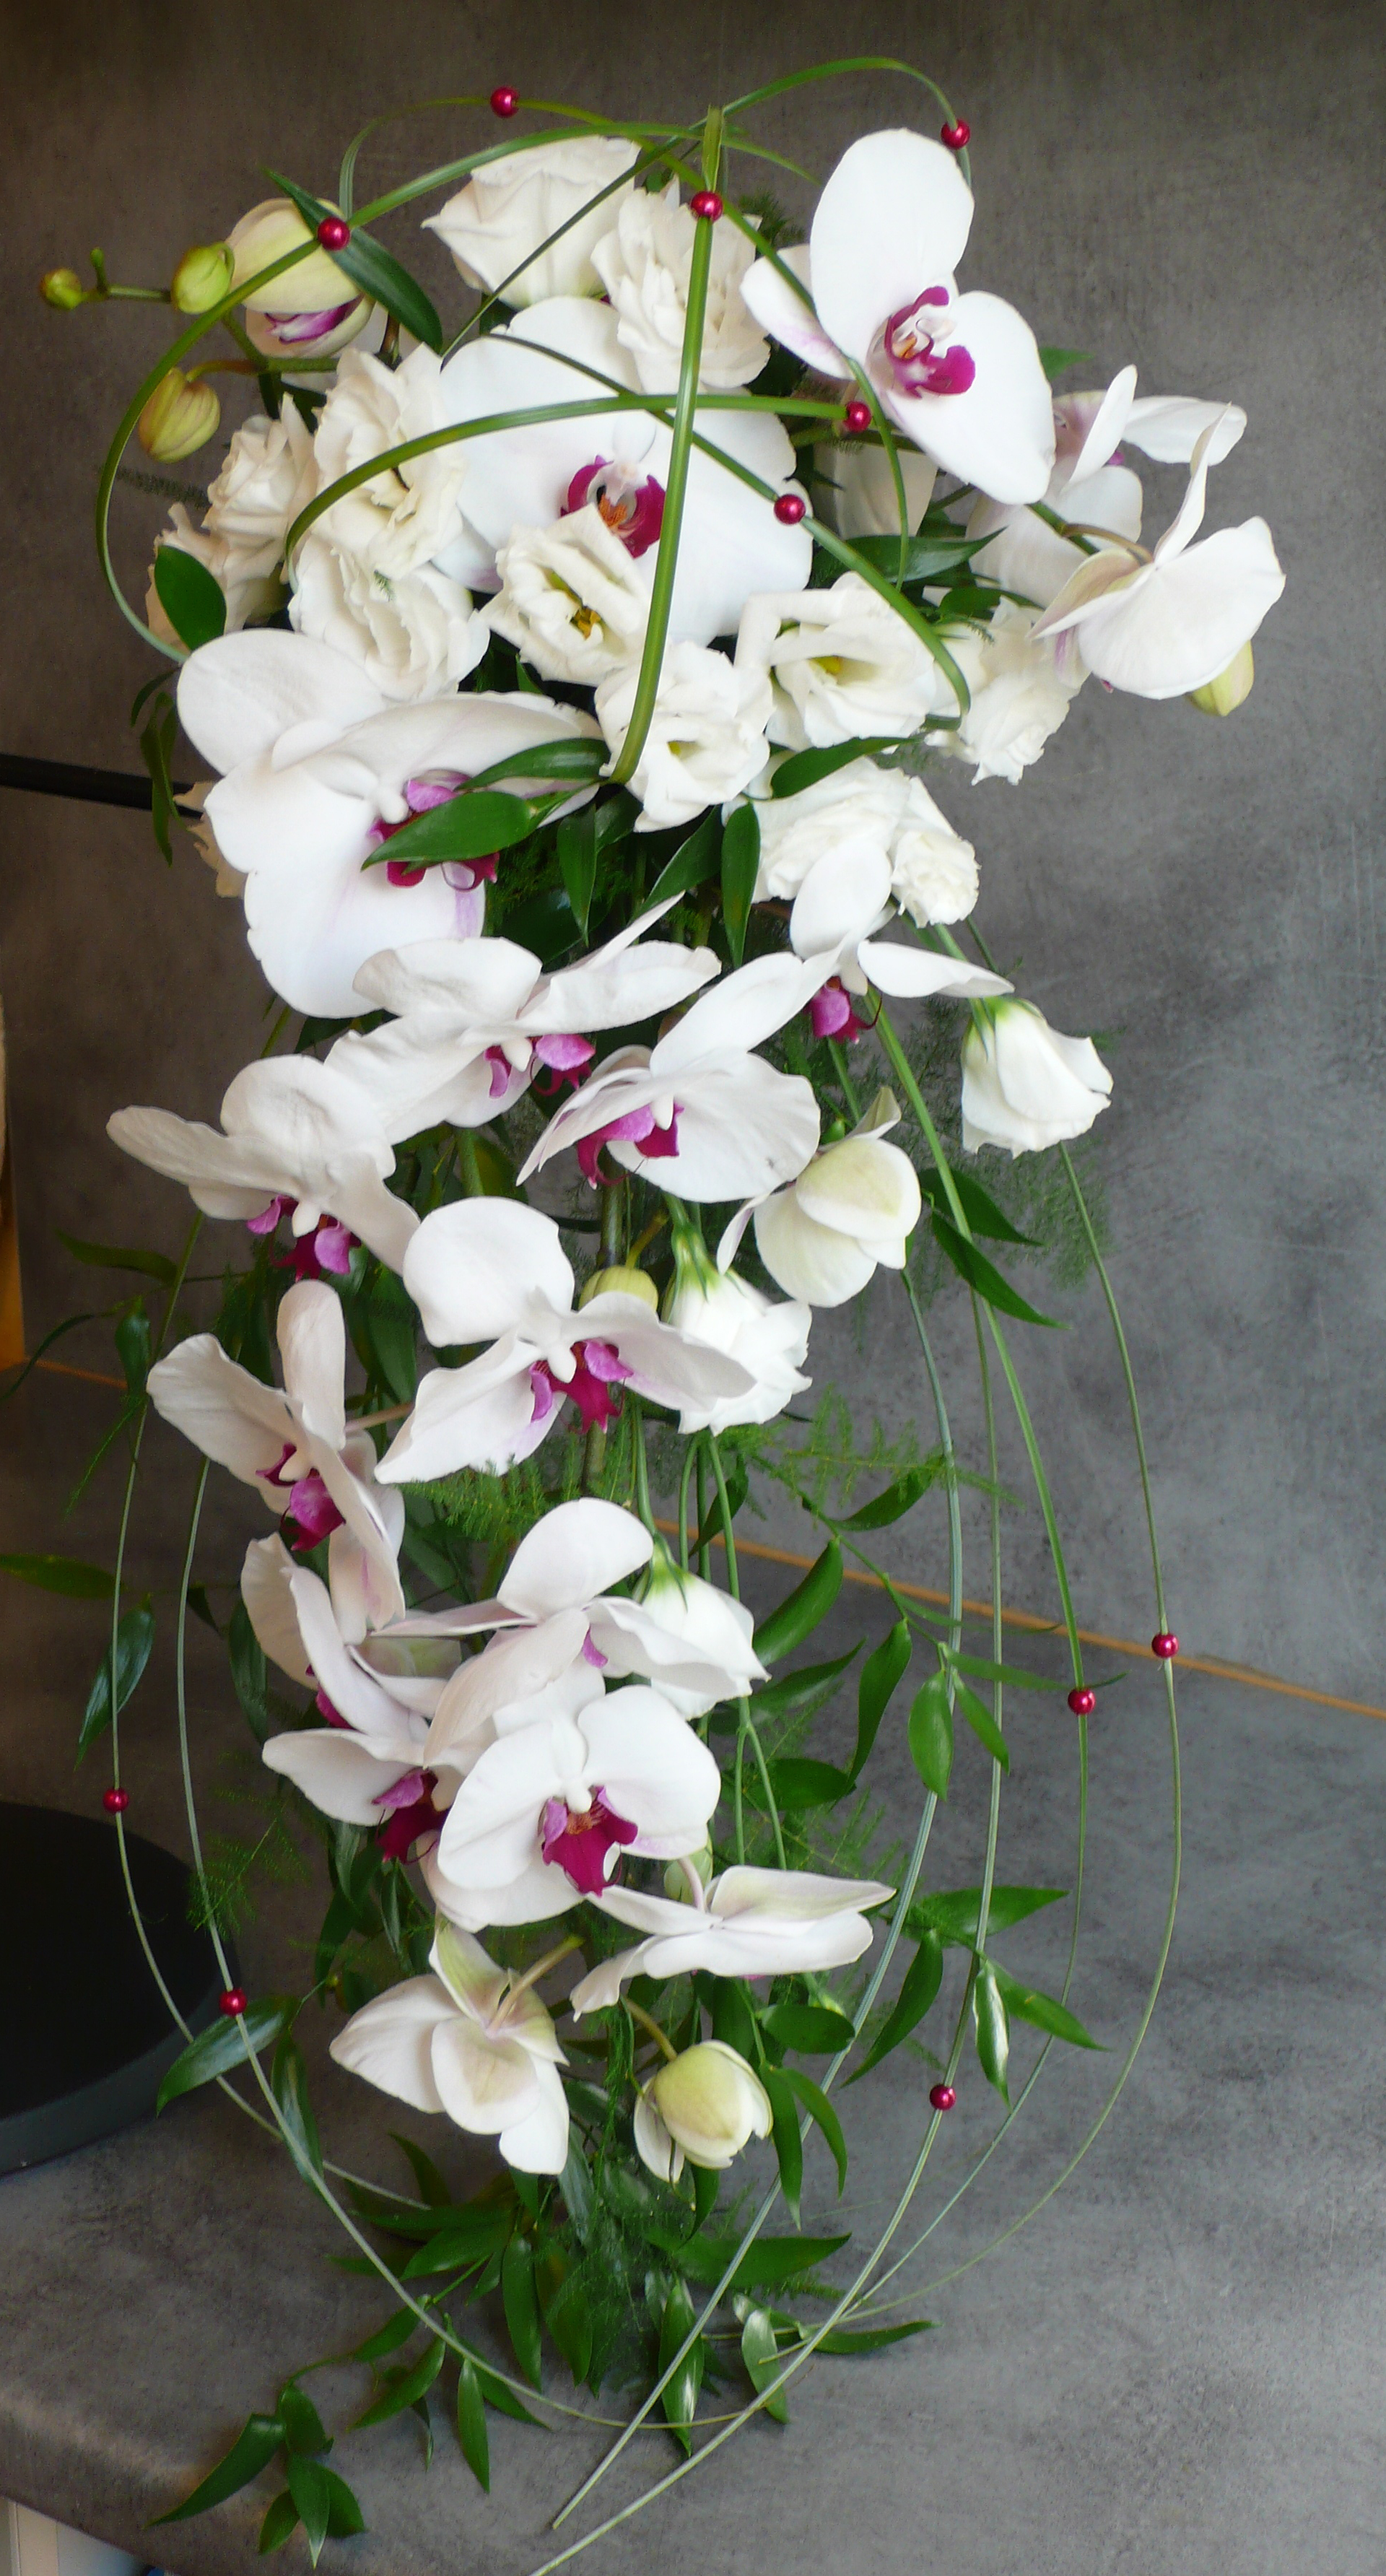 Bouquet mari e orchid e ruscus asparagus beargrass perles fleurs mariage lasourisverte10 - Bouquet mariee orchidee ...